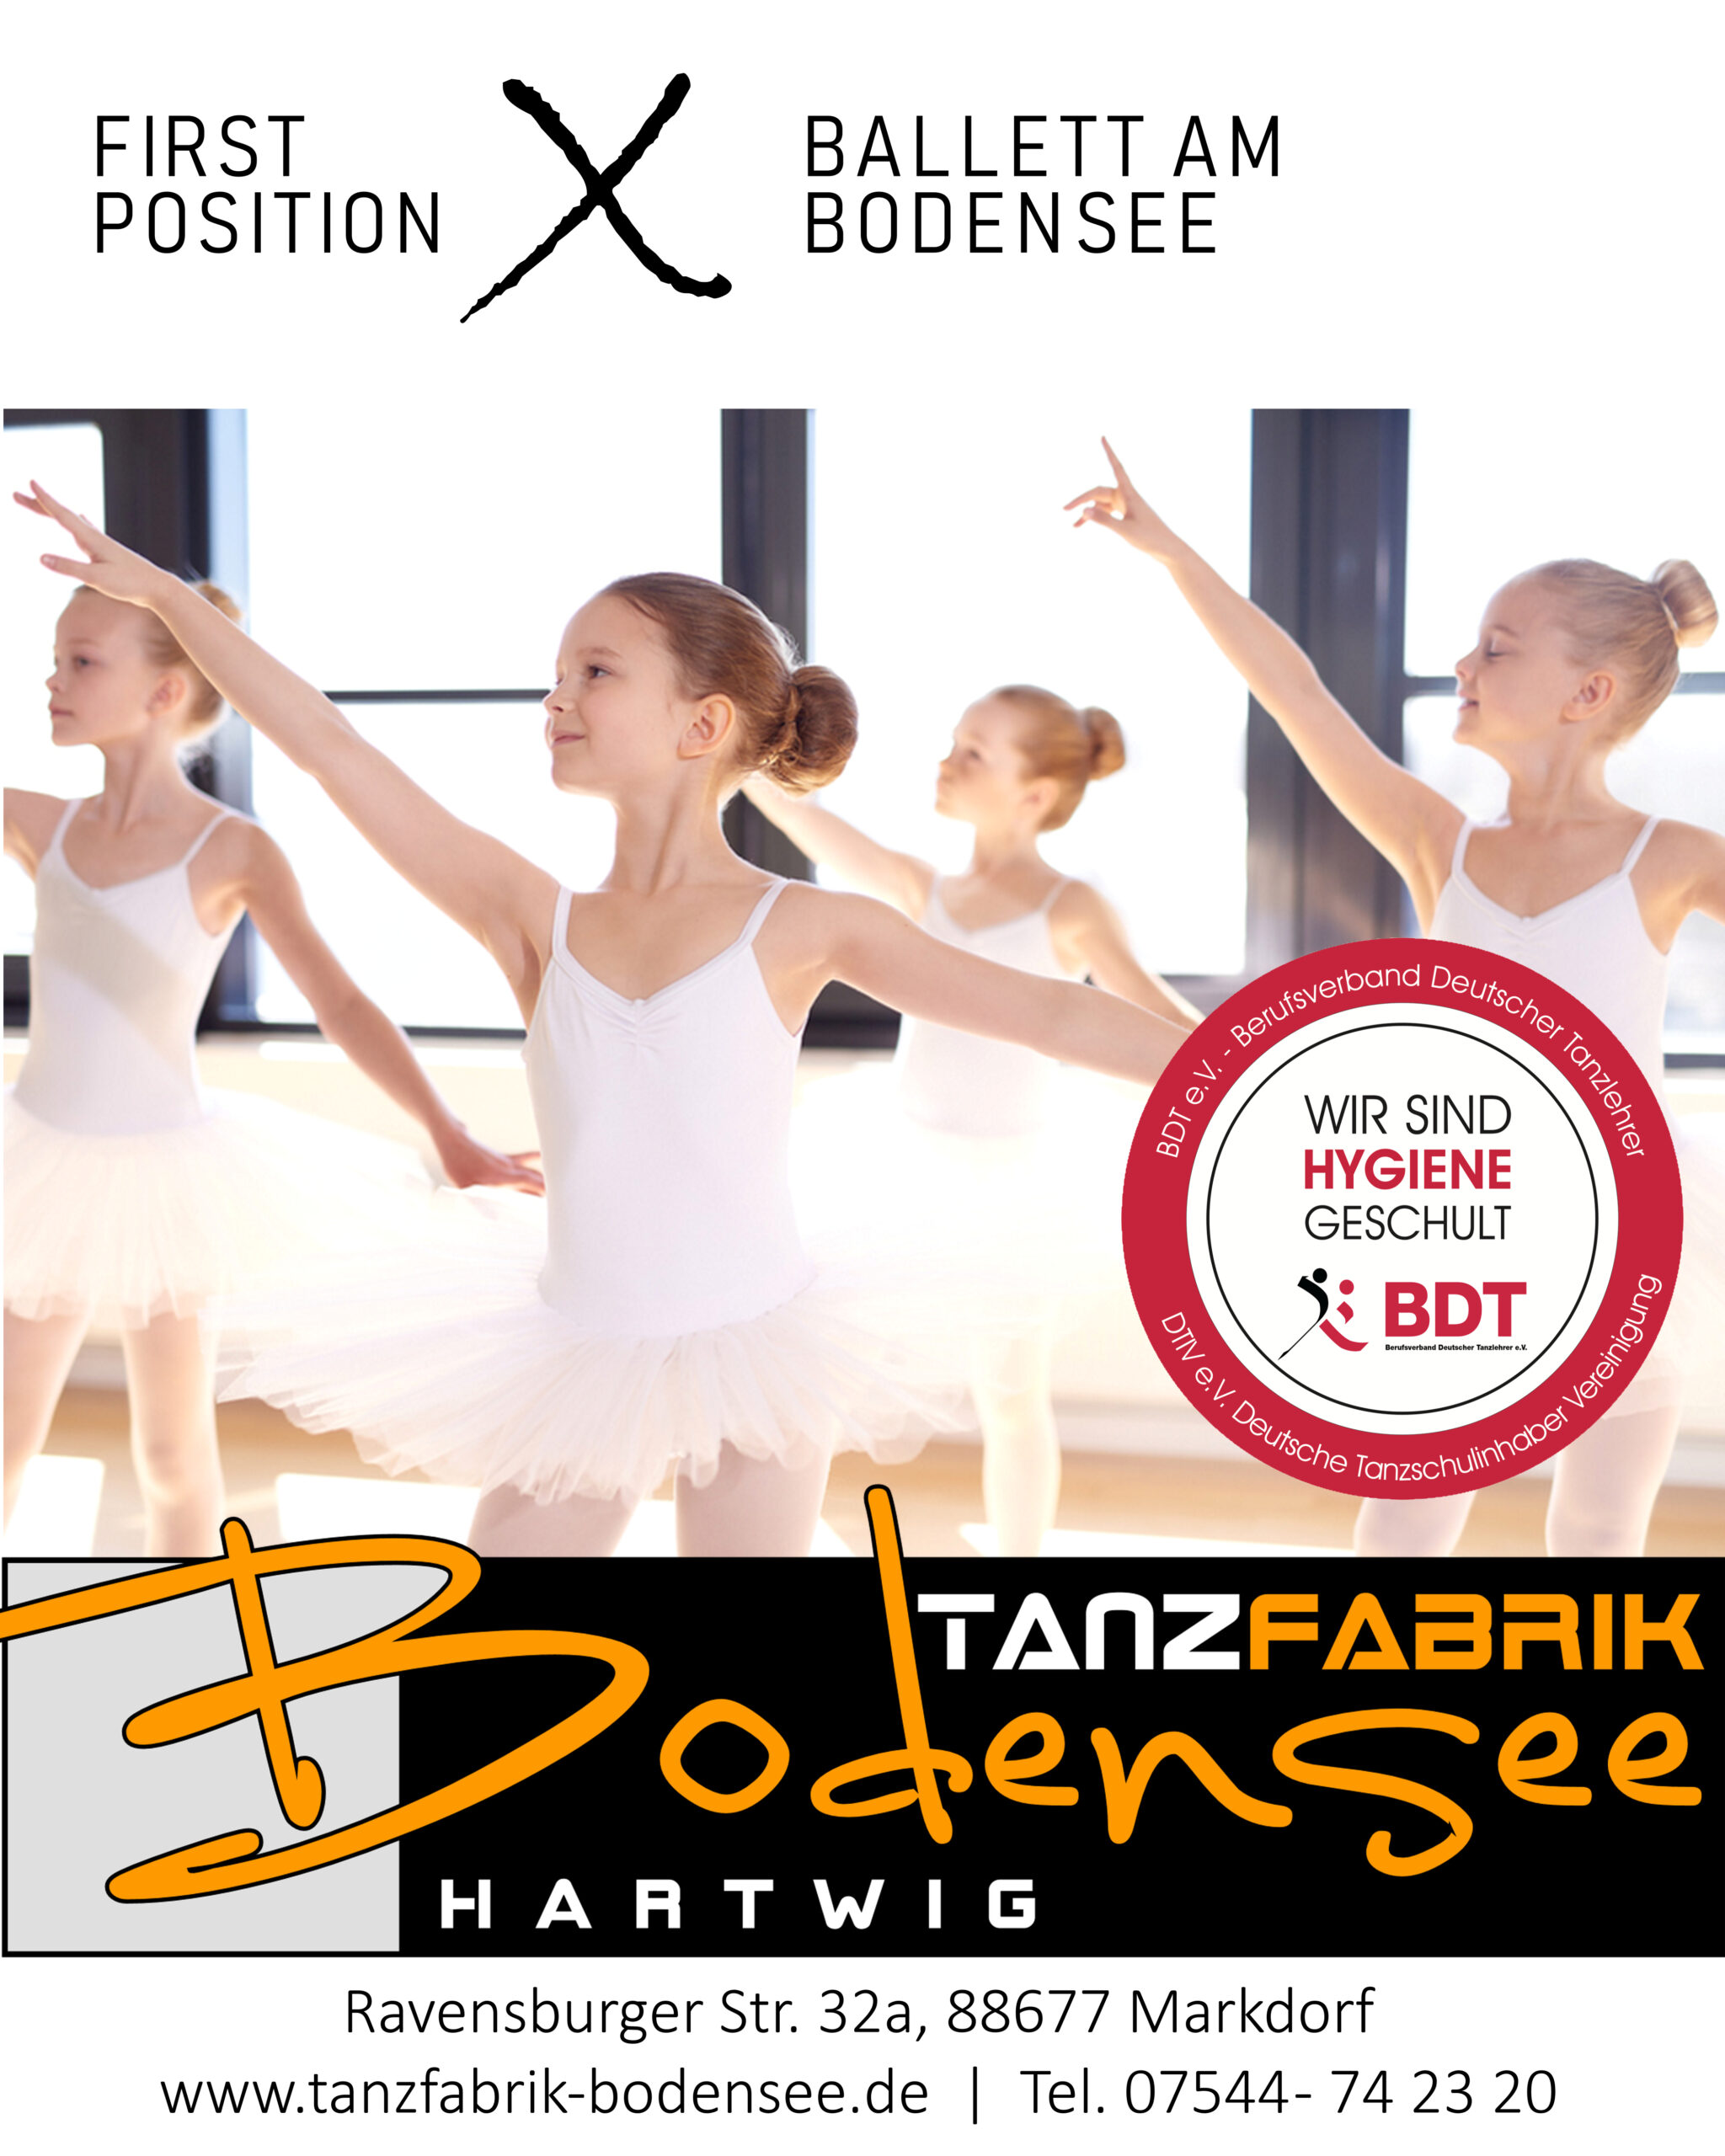 Ballett am Bodensee